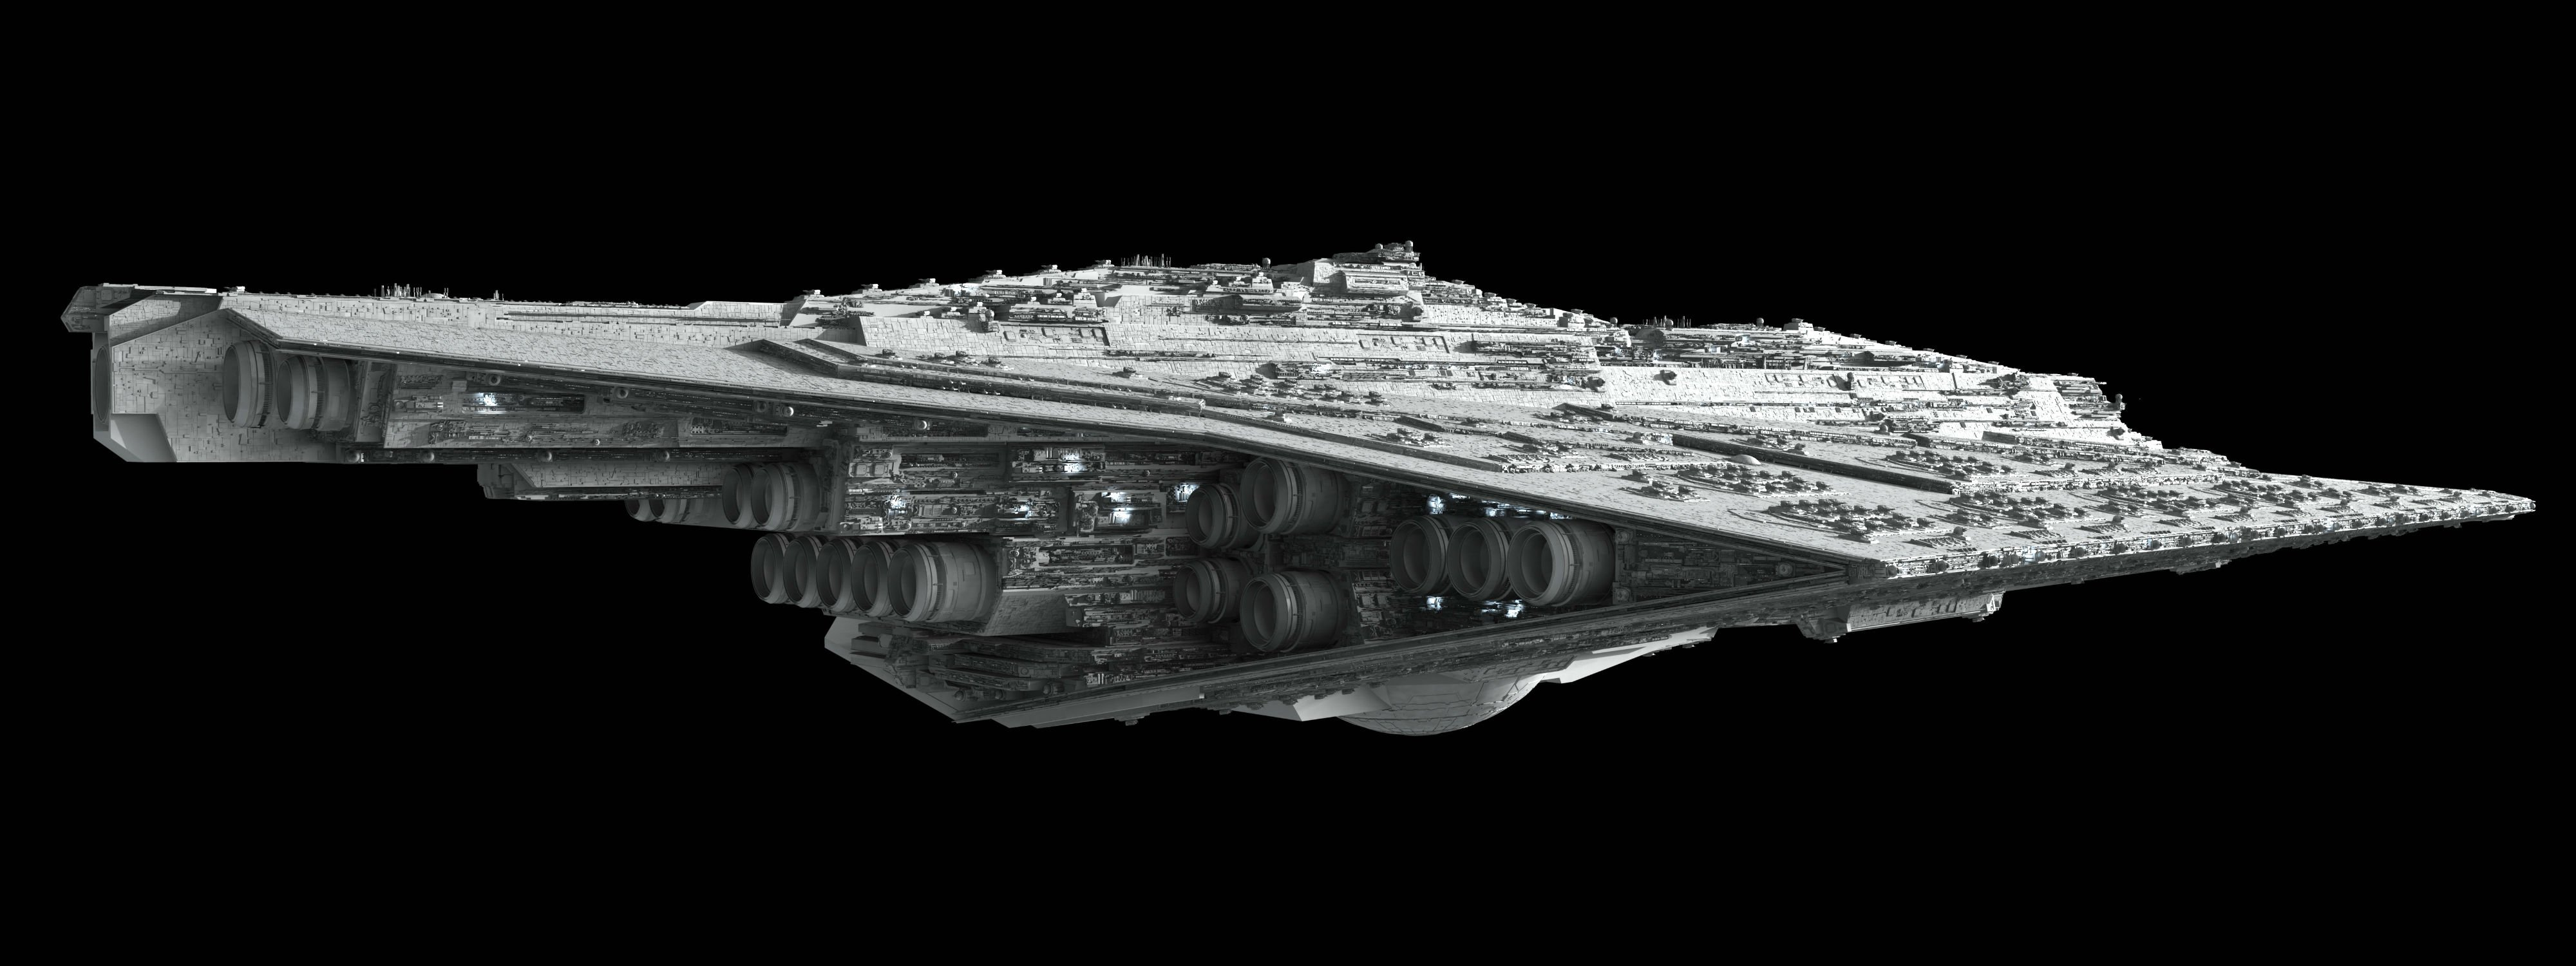 star destroyer star wars spaceship sci fi space wallpaper 4000x1500 633019 wallpaperup. Black Bedroom Furniture Sets. Home Design Ideas